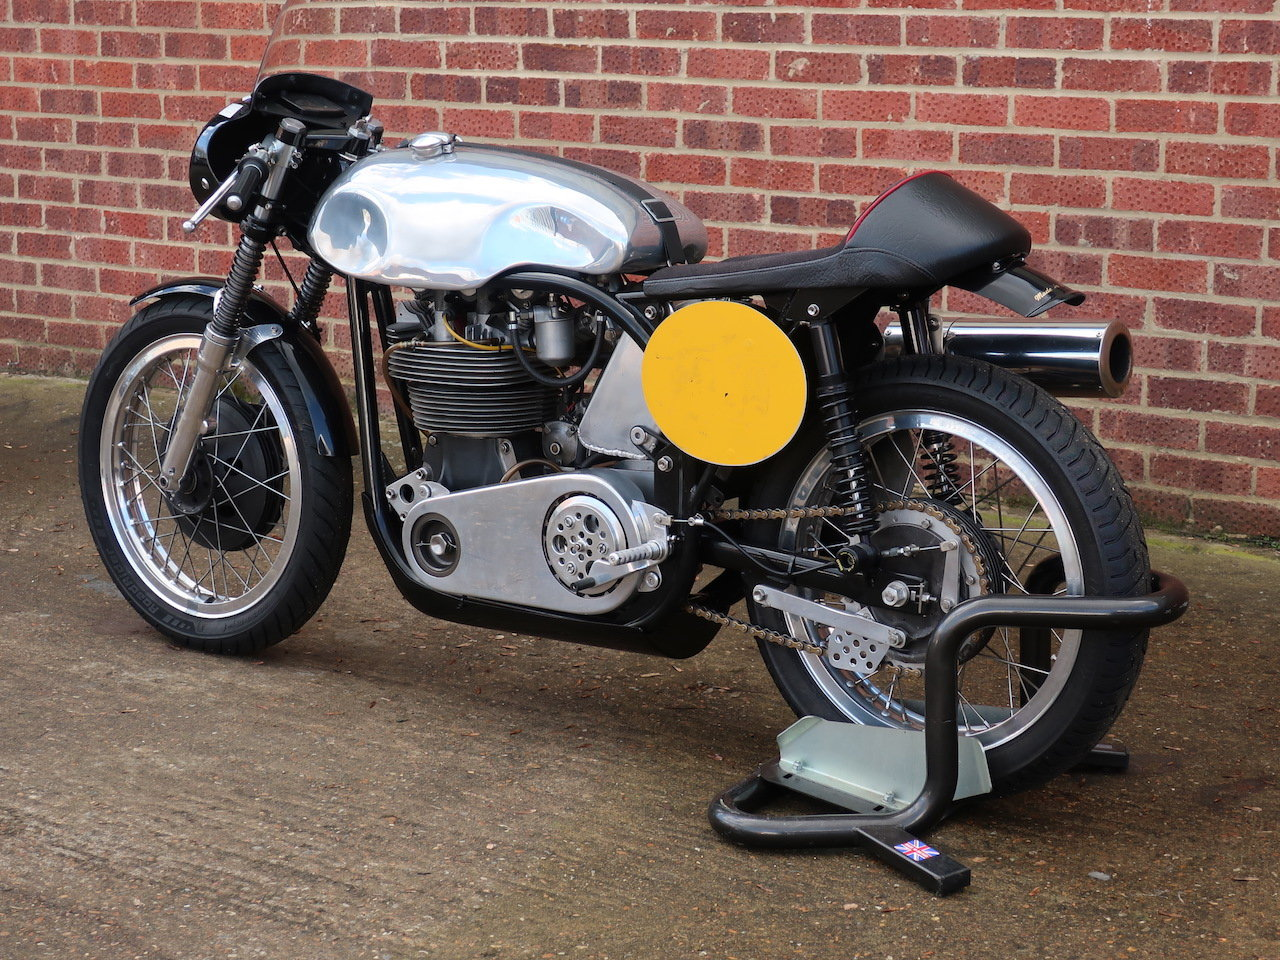 2007 Norton M30 Manx 500cc Race Bike For Sale (picture 5 of 6)